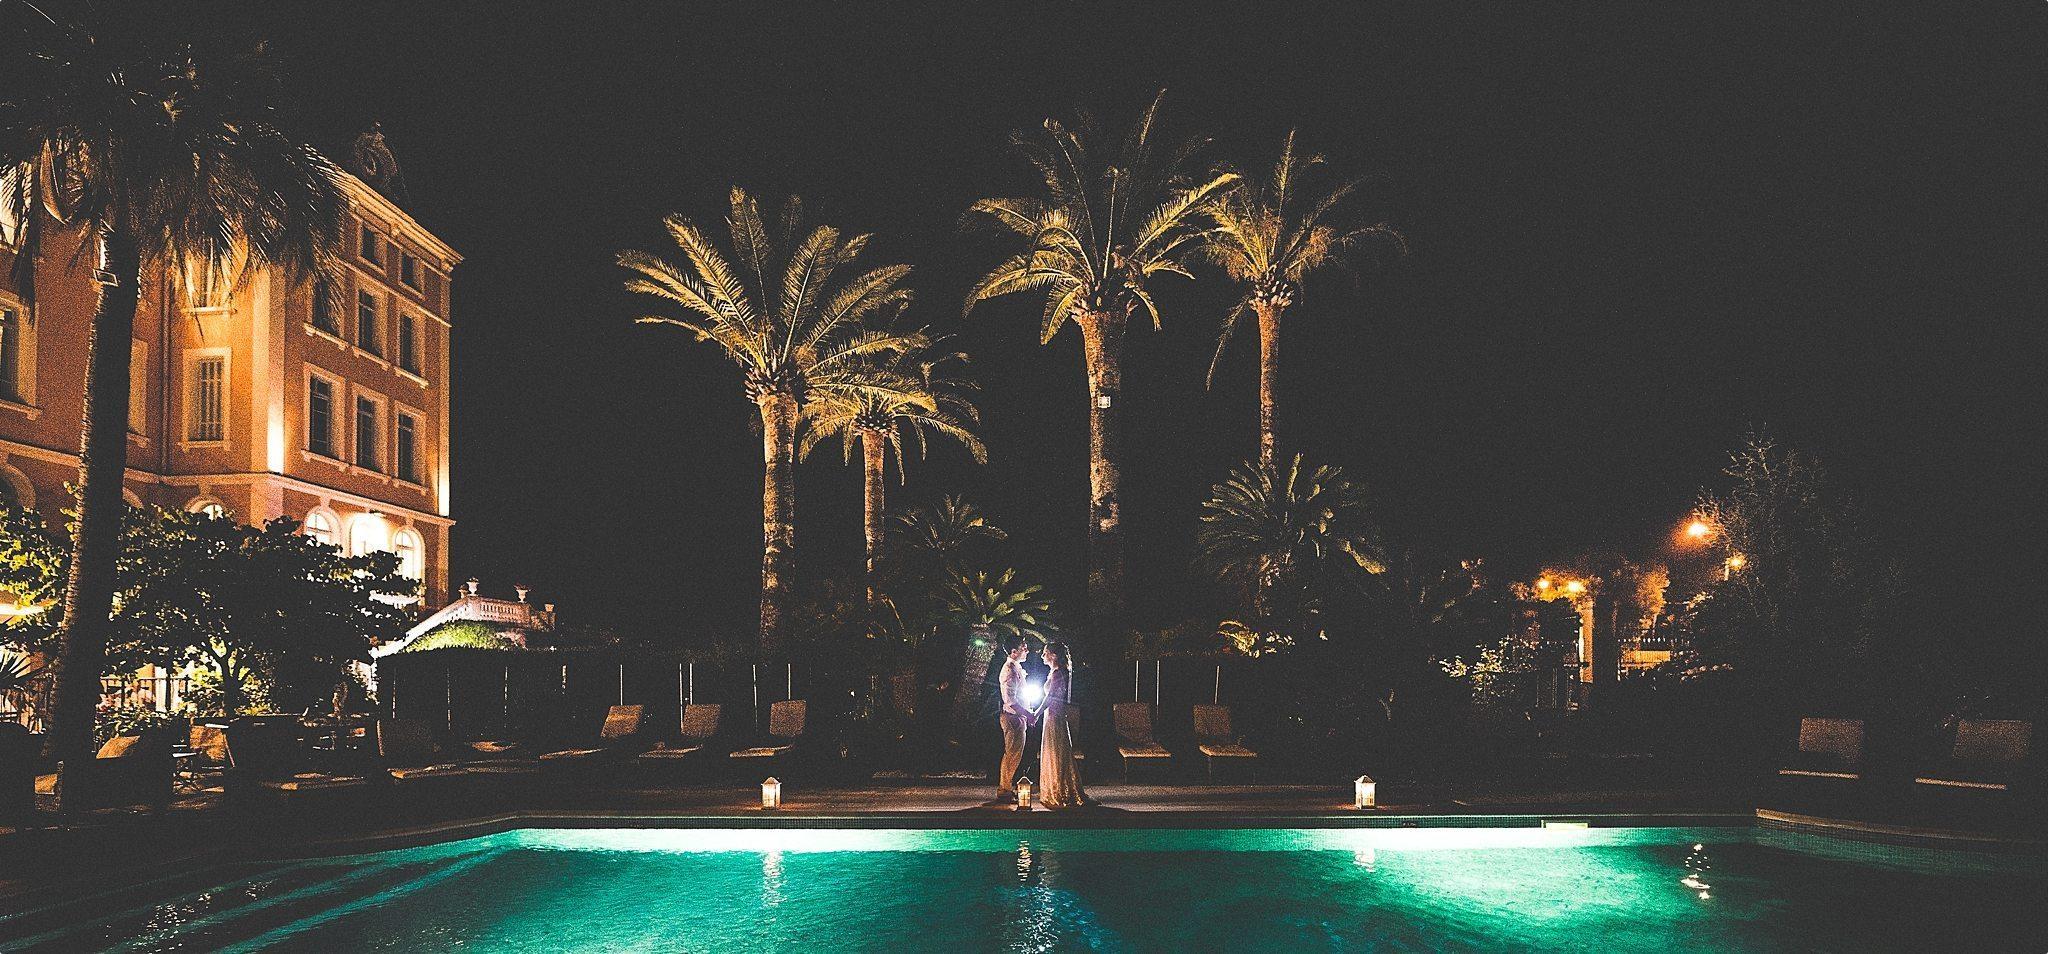 Domaine de la Croix Hotel L'Orangerie South of France vineyard and beach Wedding - Maria Assia Photography-637